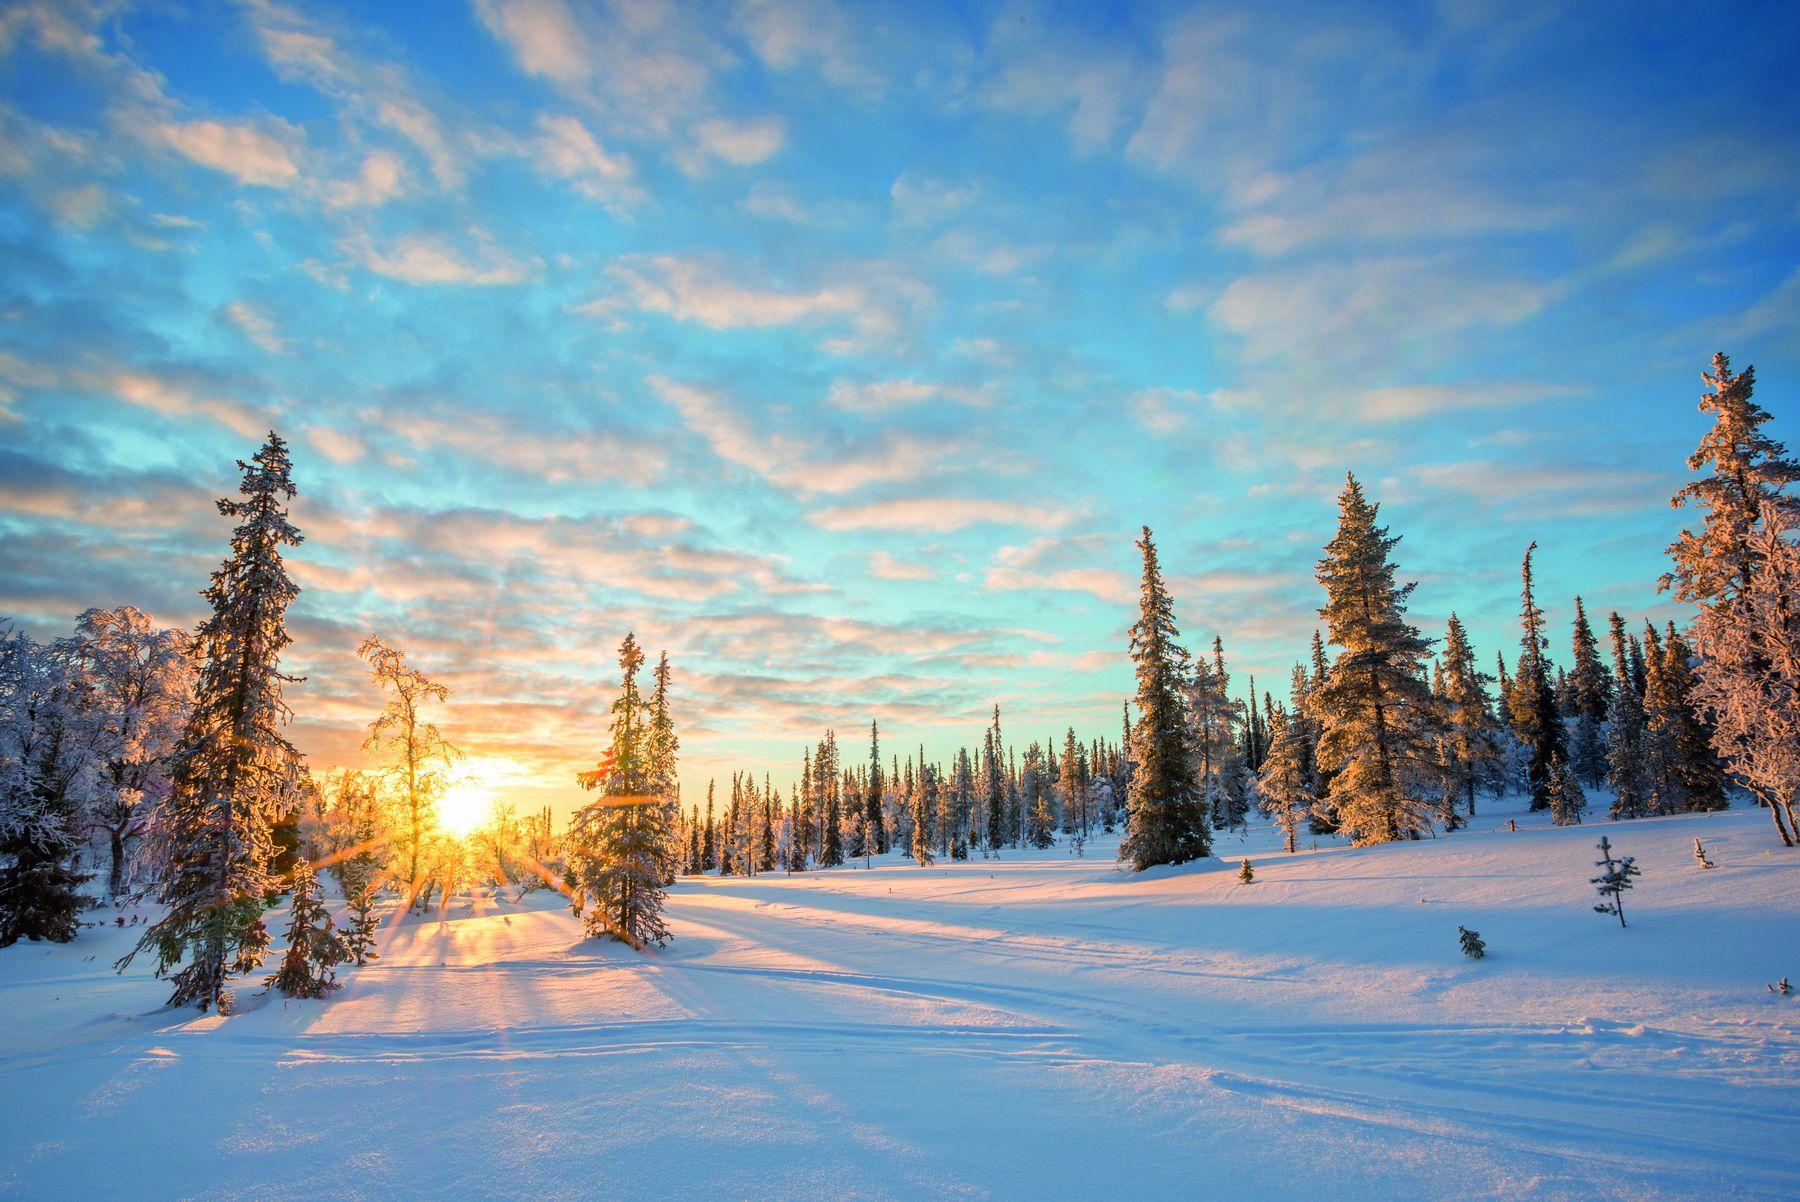 Saariselkae Lappland iStock854358142